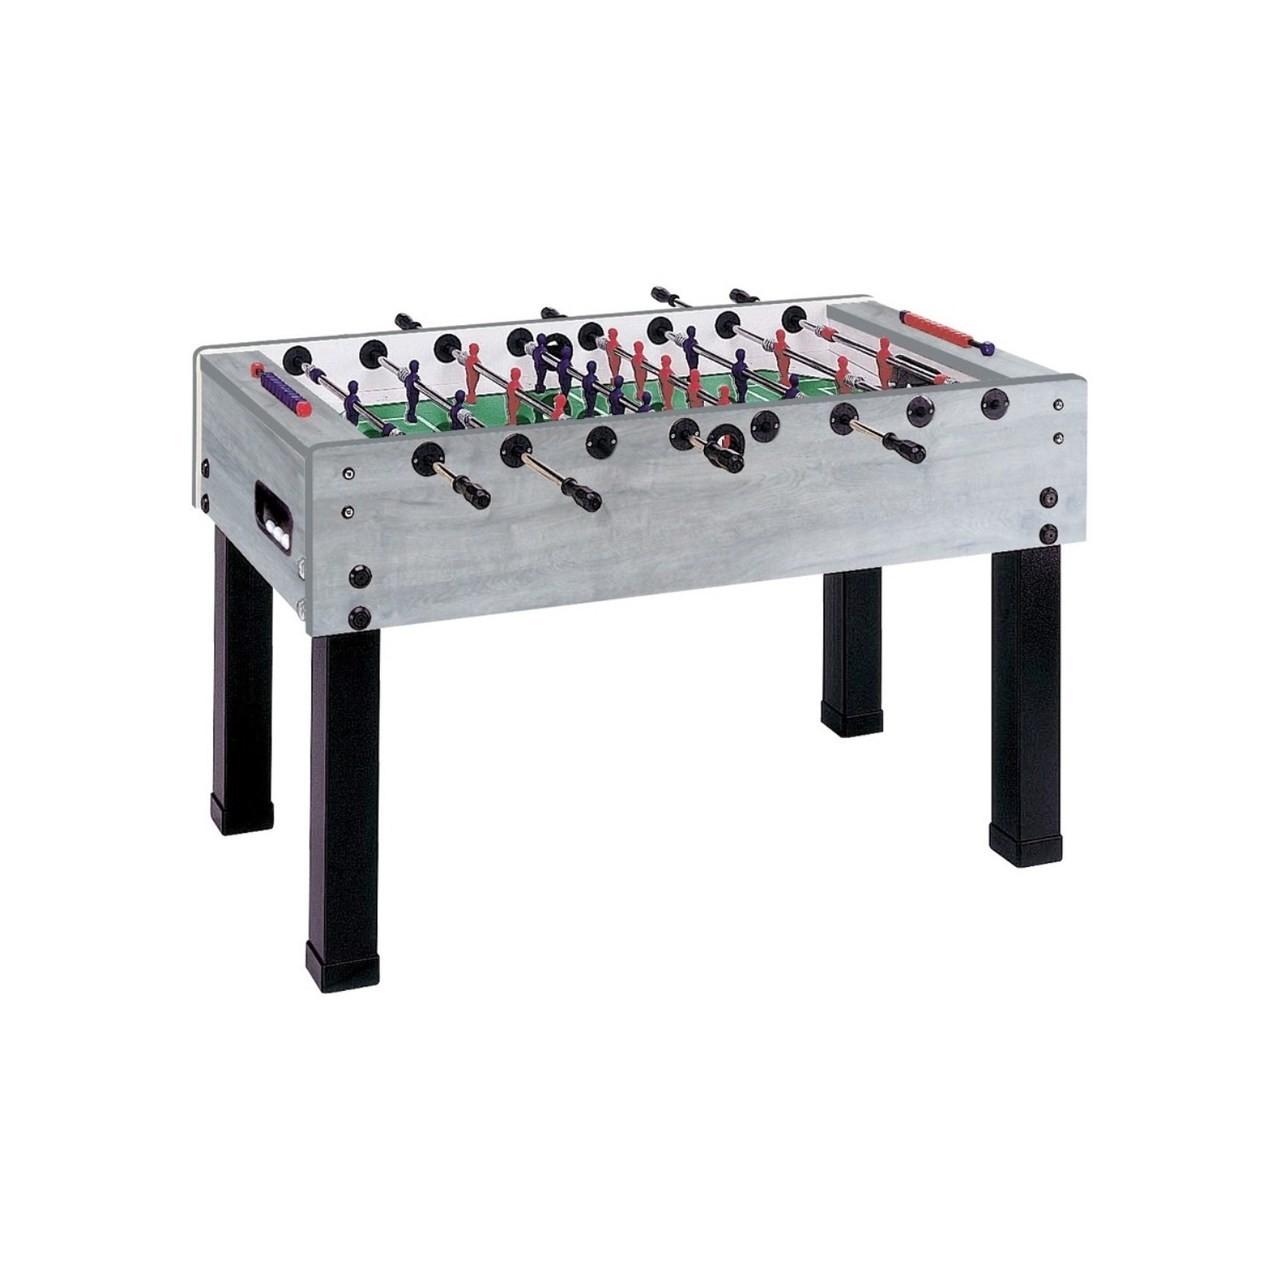 TABLE DE FOOSBALL GARLANDO G-500 en Chêne rouvre